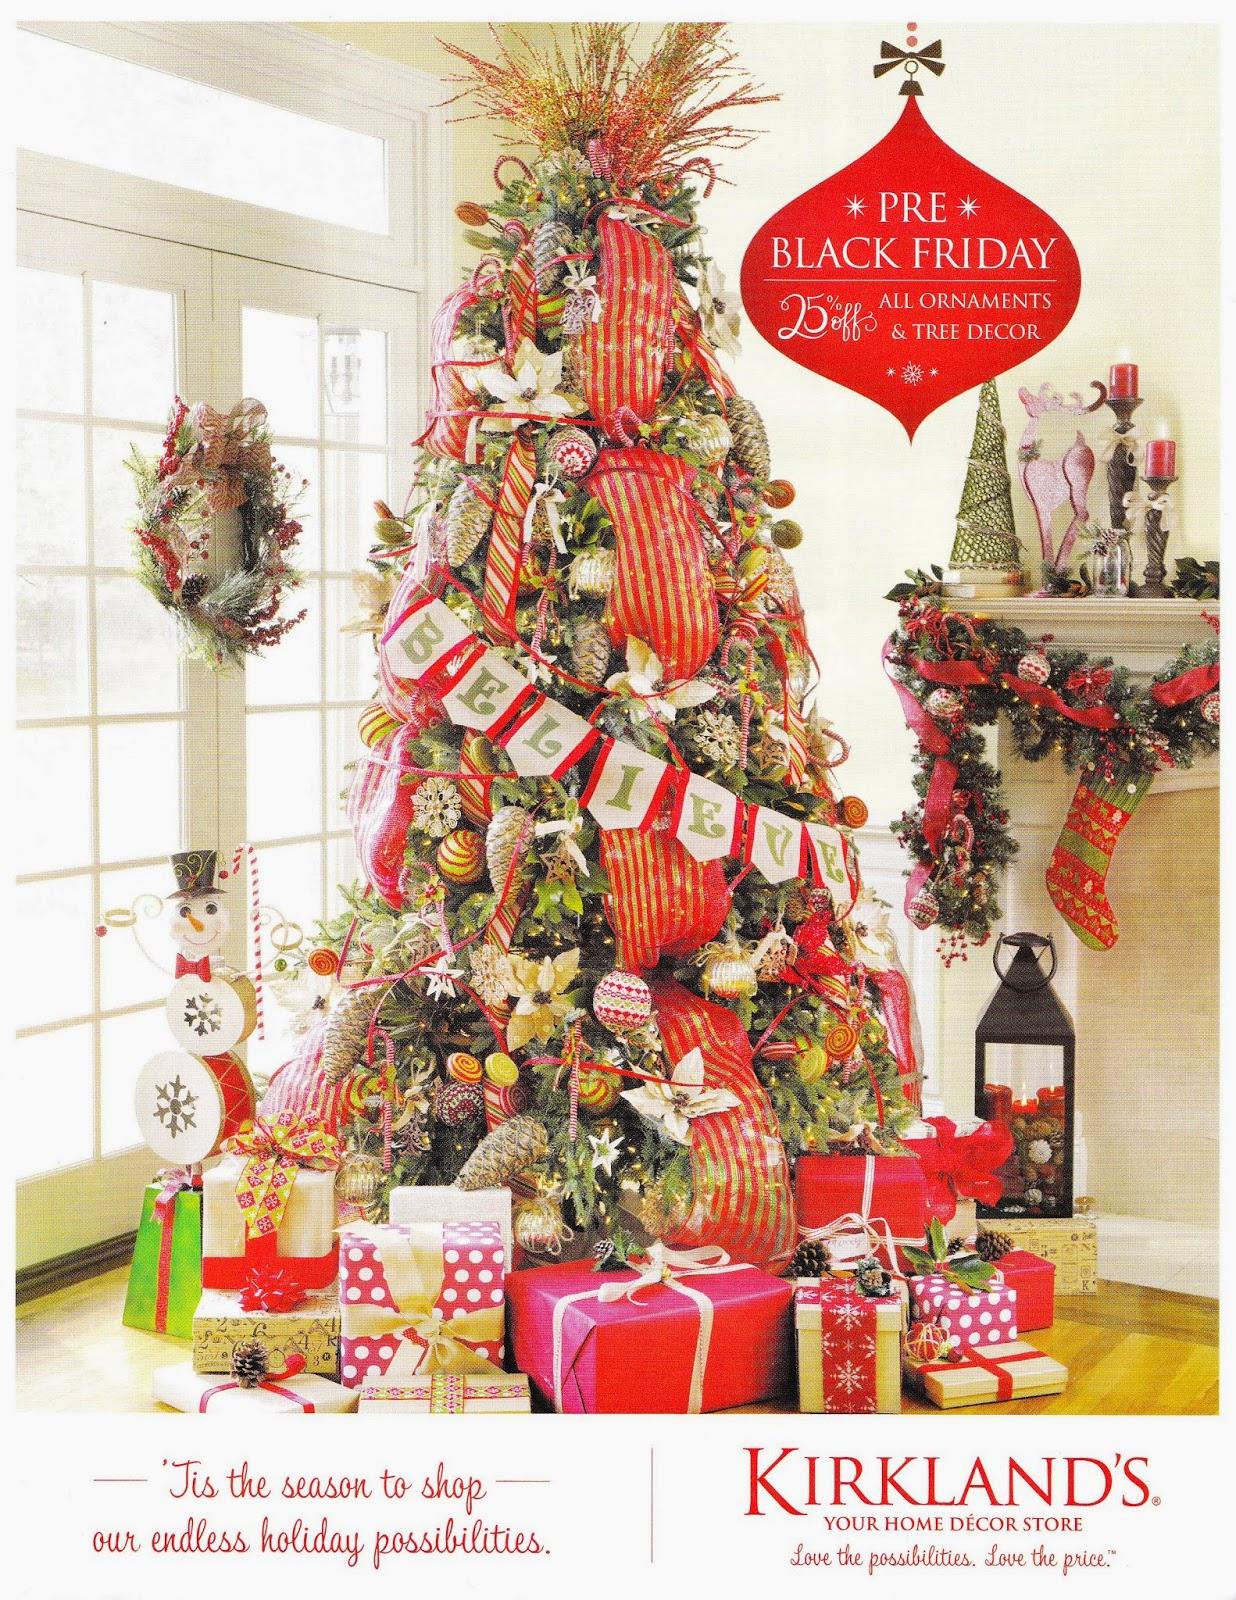 DIY180: Christmas 2014 Handmade Gift - Secret Santa Blog Tour